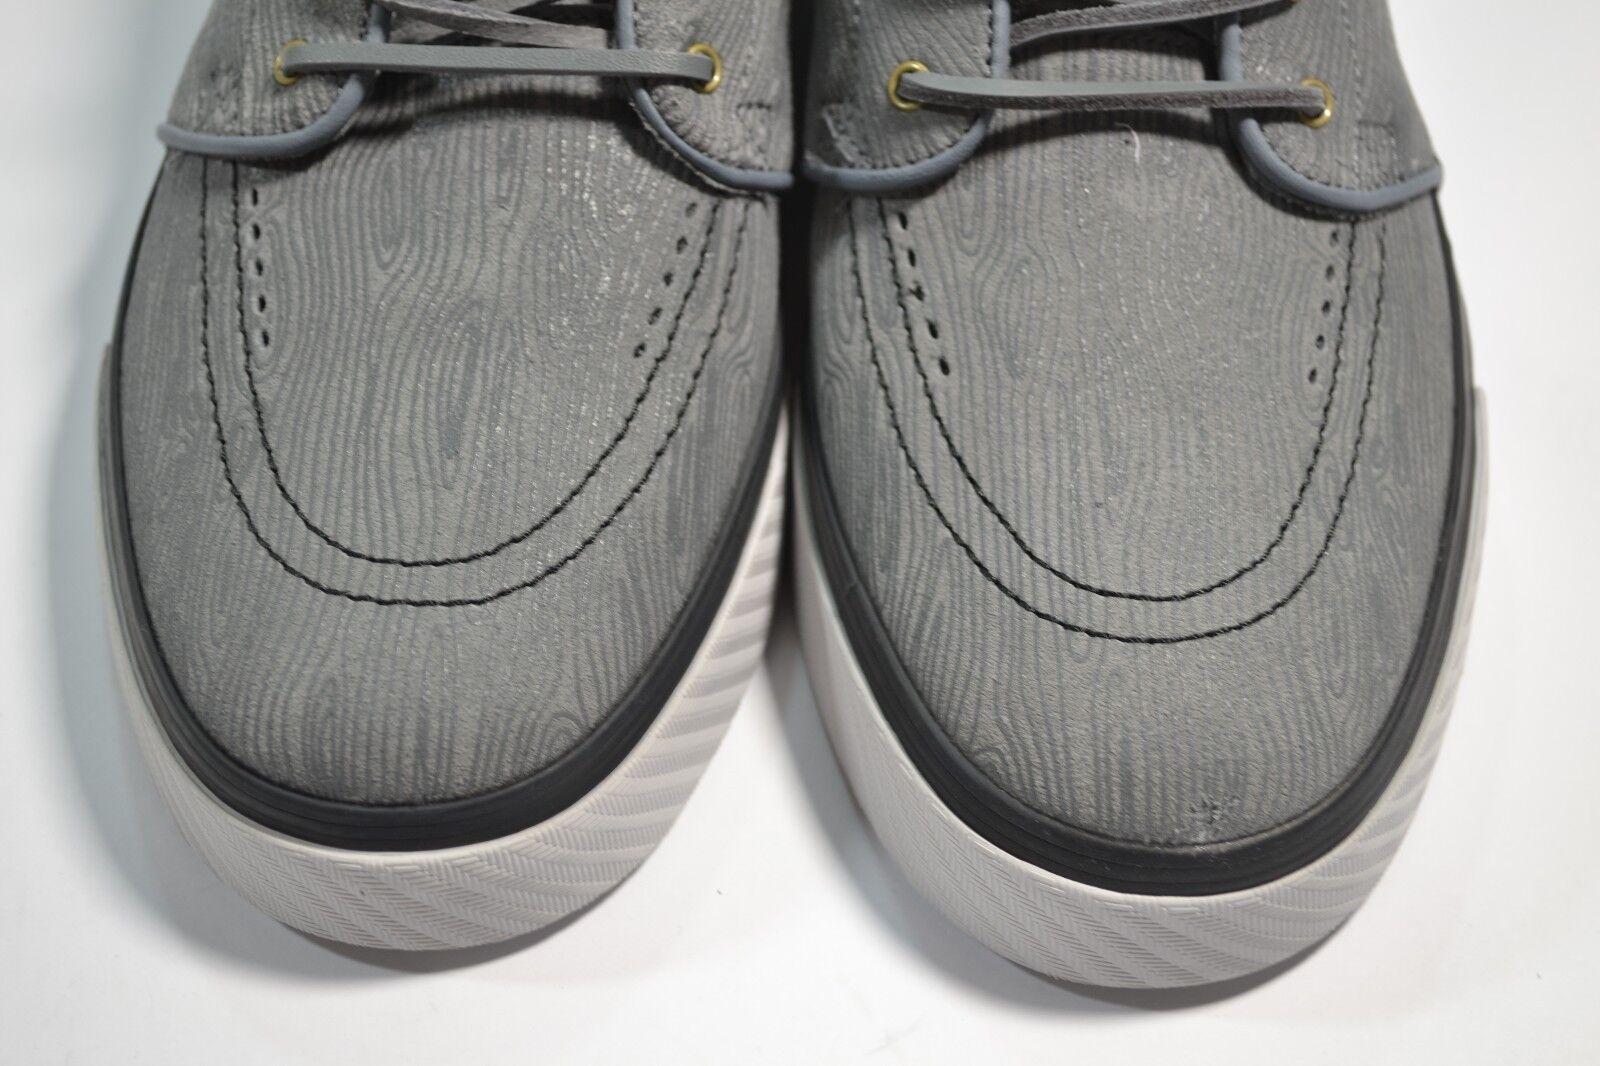 nike zoom stfan stfan stfan janoski pr se cool grey black ash) (465), scarpe da uomo   marche    Gentiluomo/Signora Scarpa    Maschio/Ragazze Scarpa    Uomo/Donna Scarpa  7a02f3